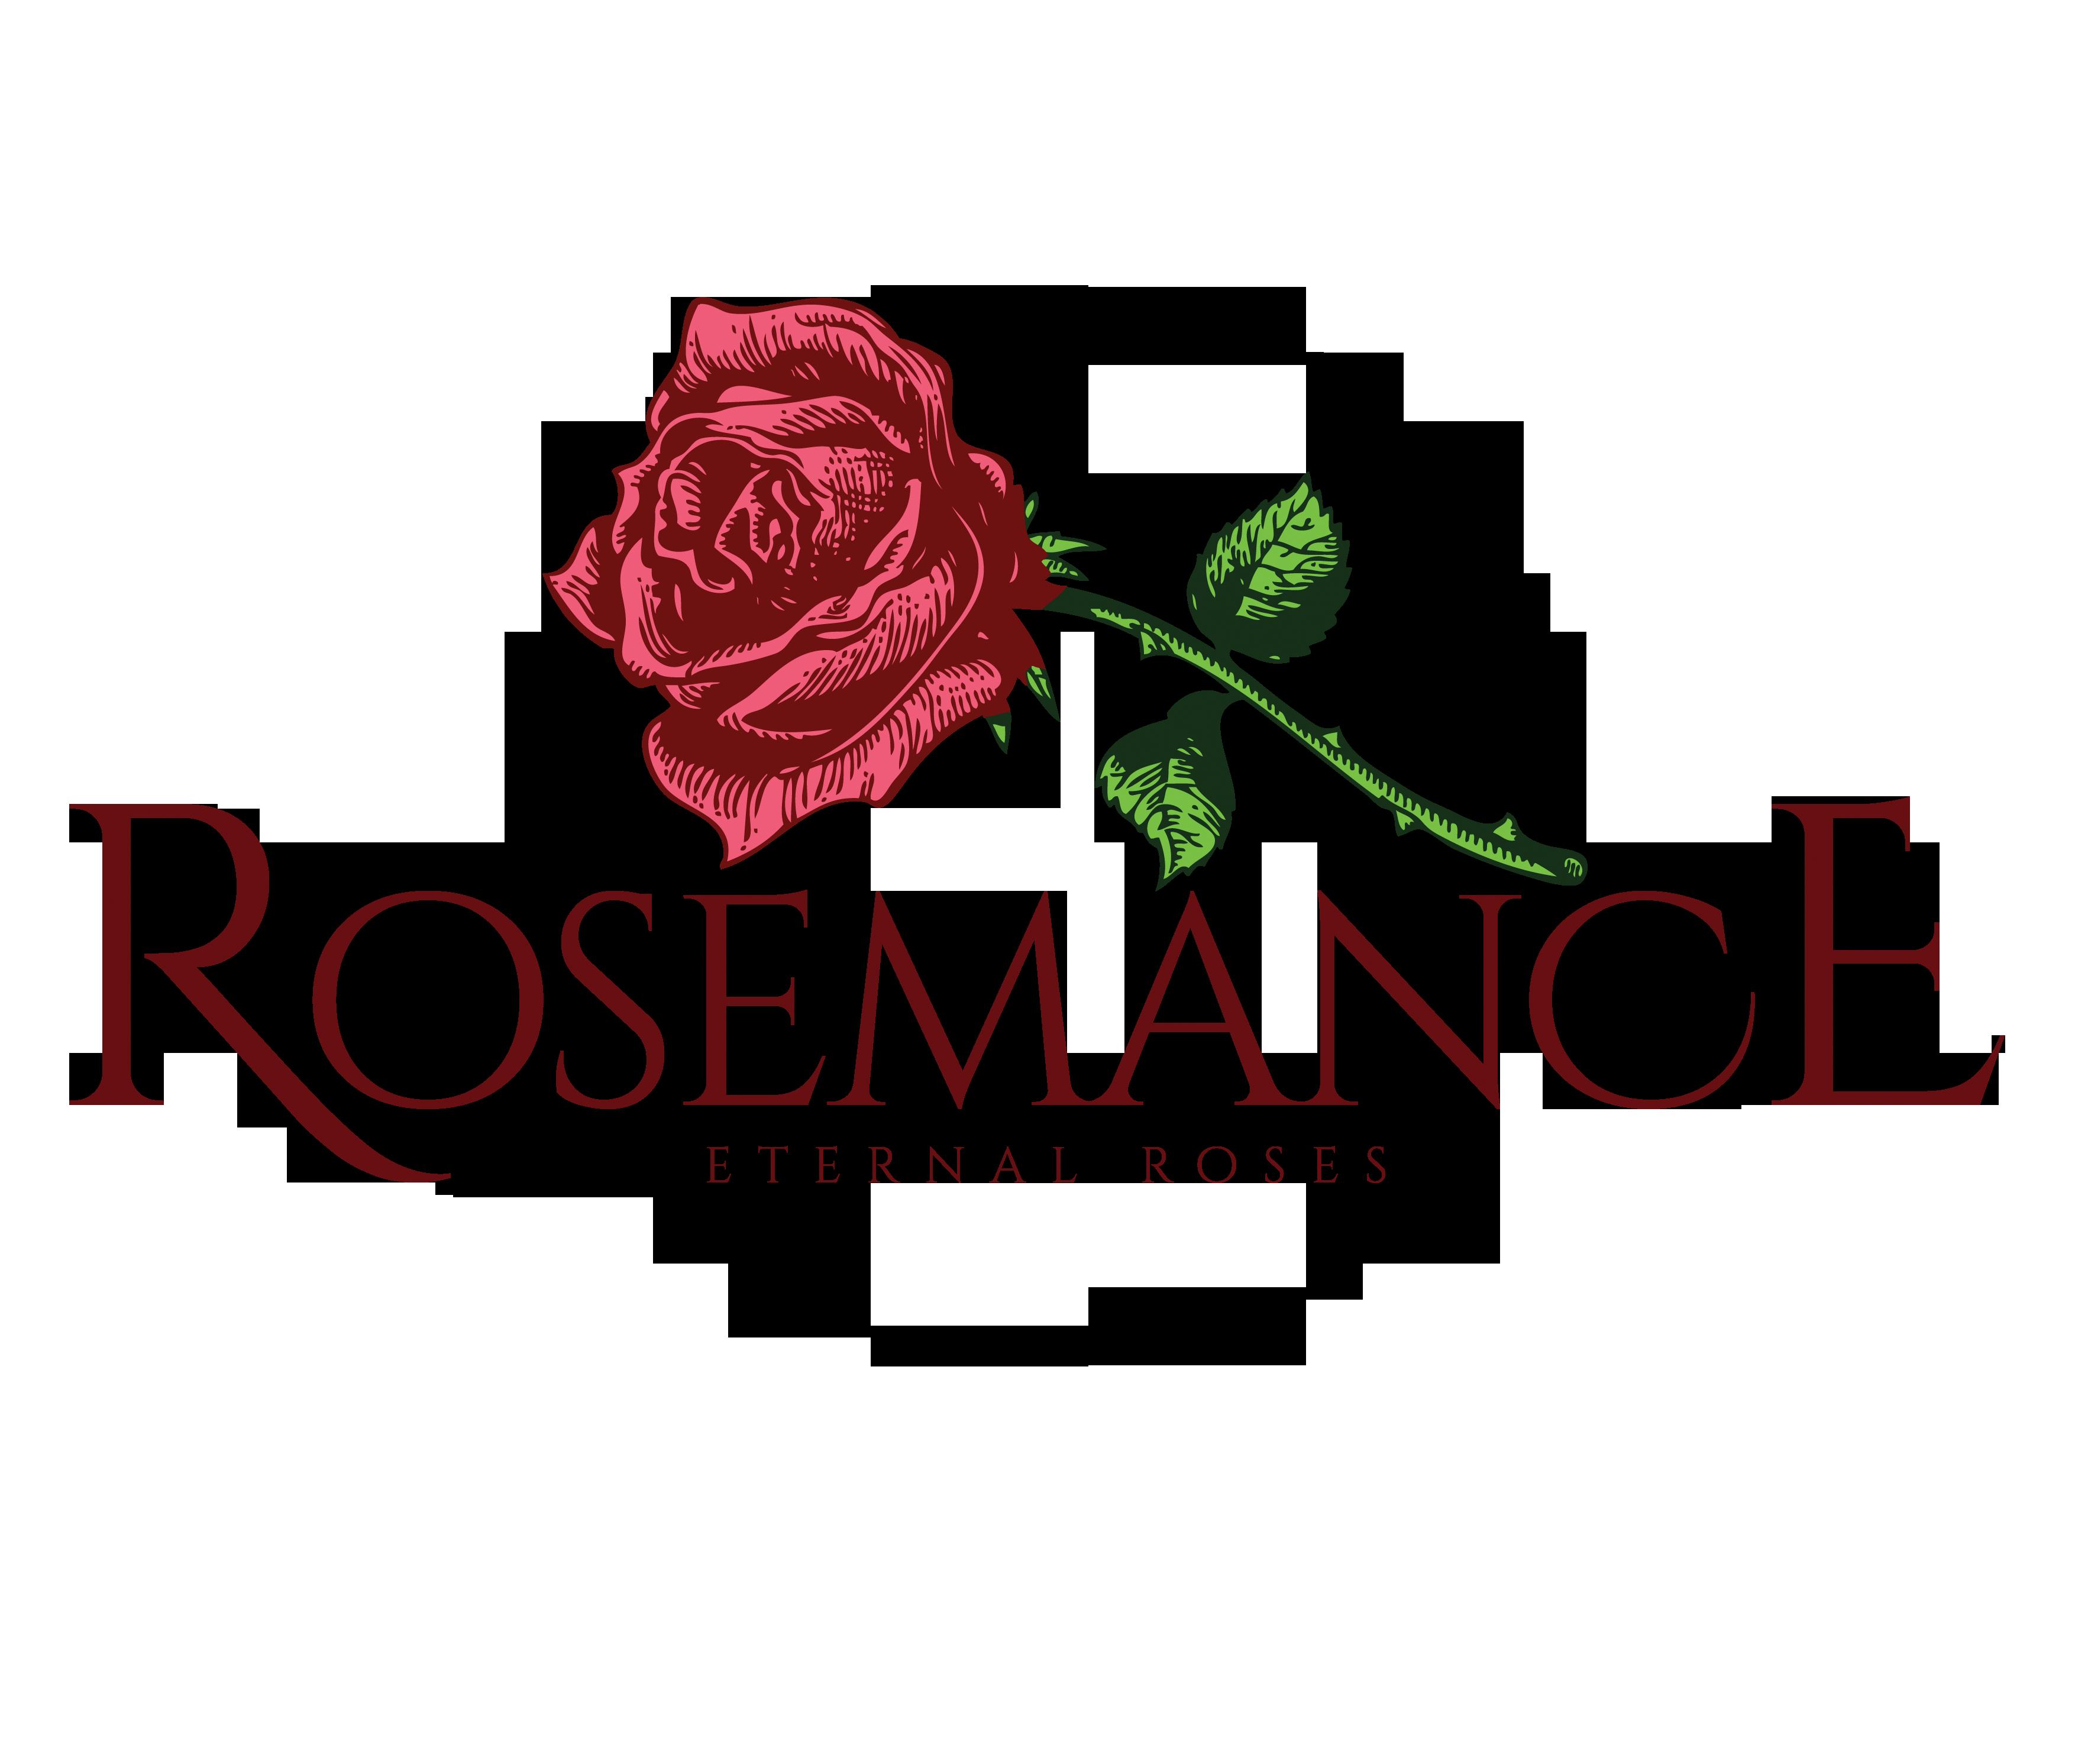 Rosemance needs a cool logo